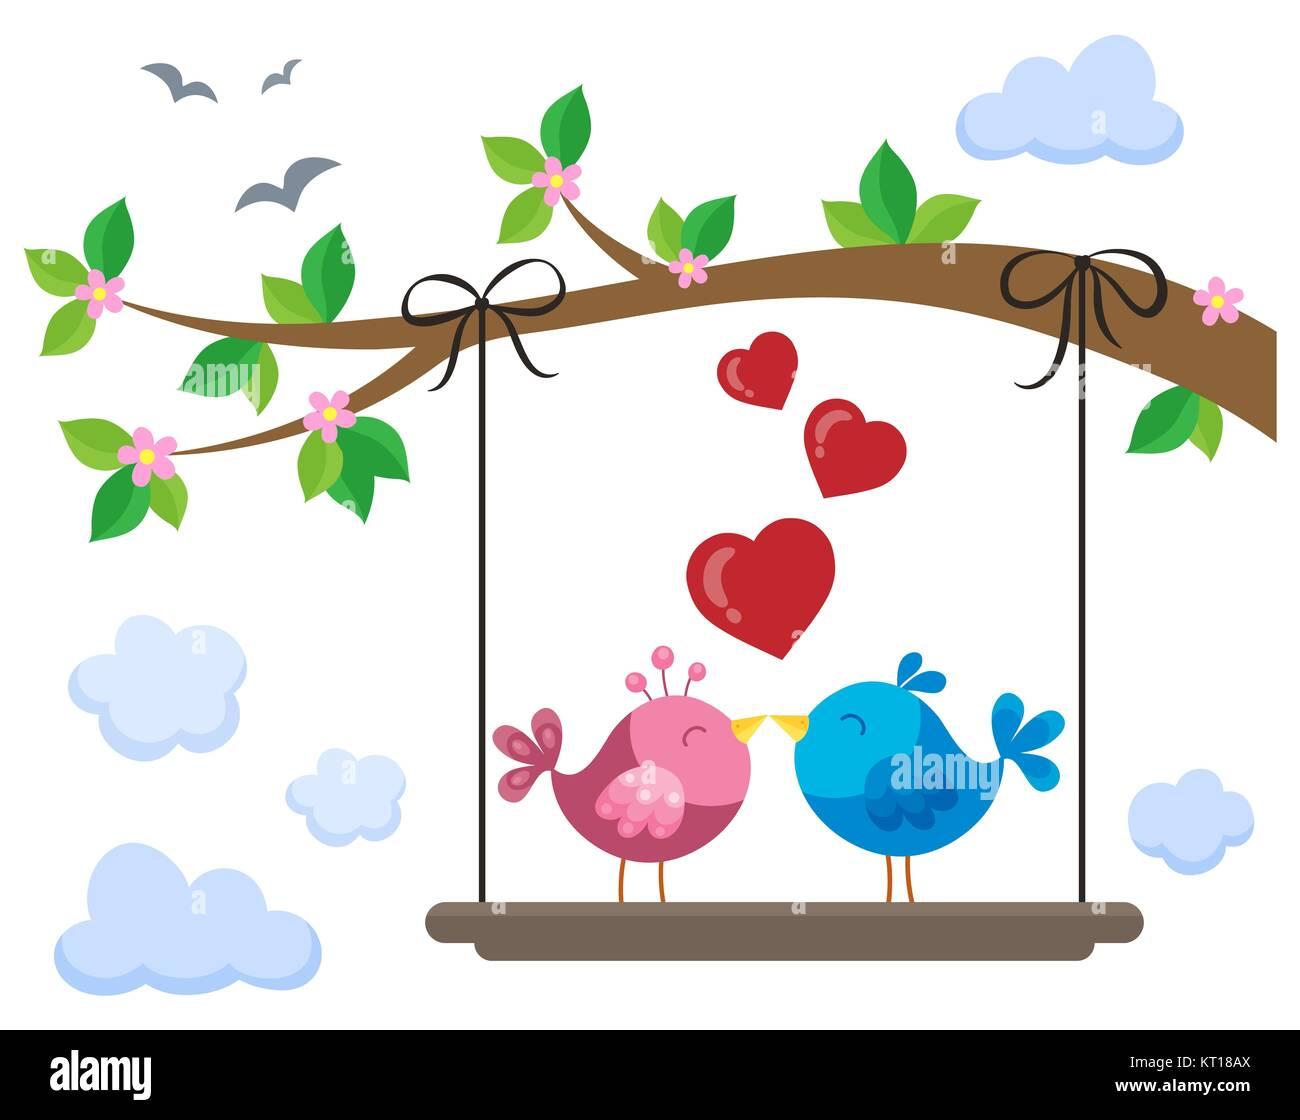 Valentine birds on board below branch 1 - Stock Image